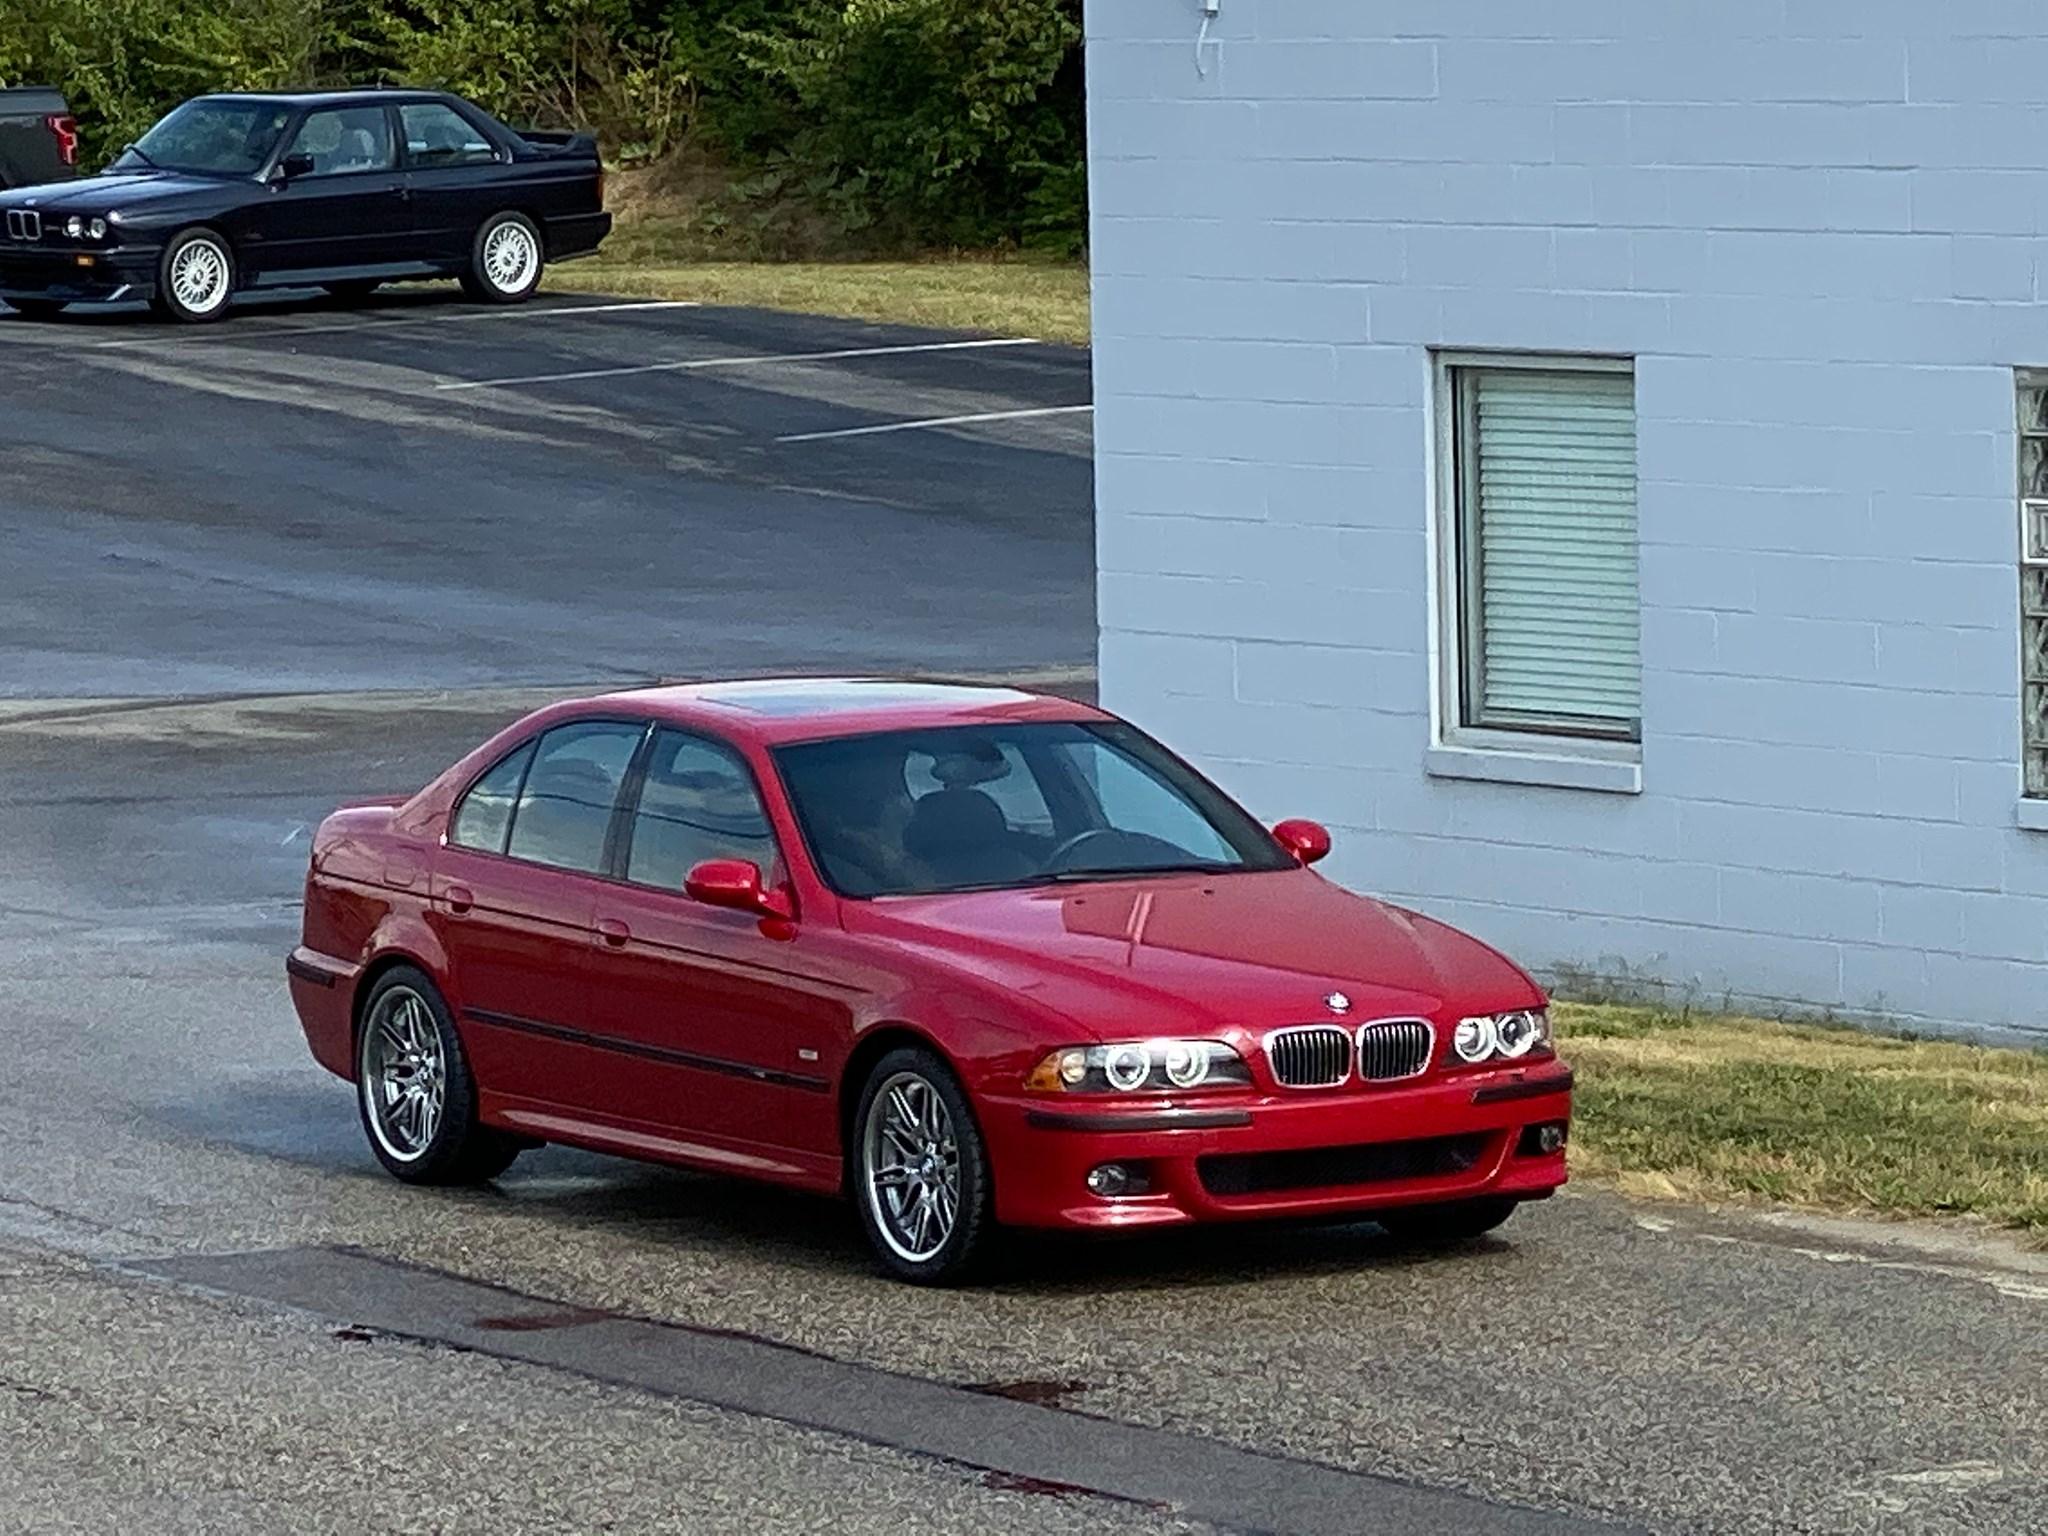 BMW_M5_E39_Imola_Red_0008